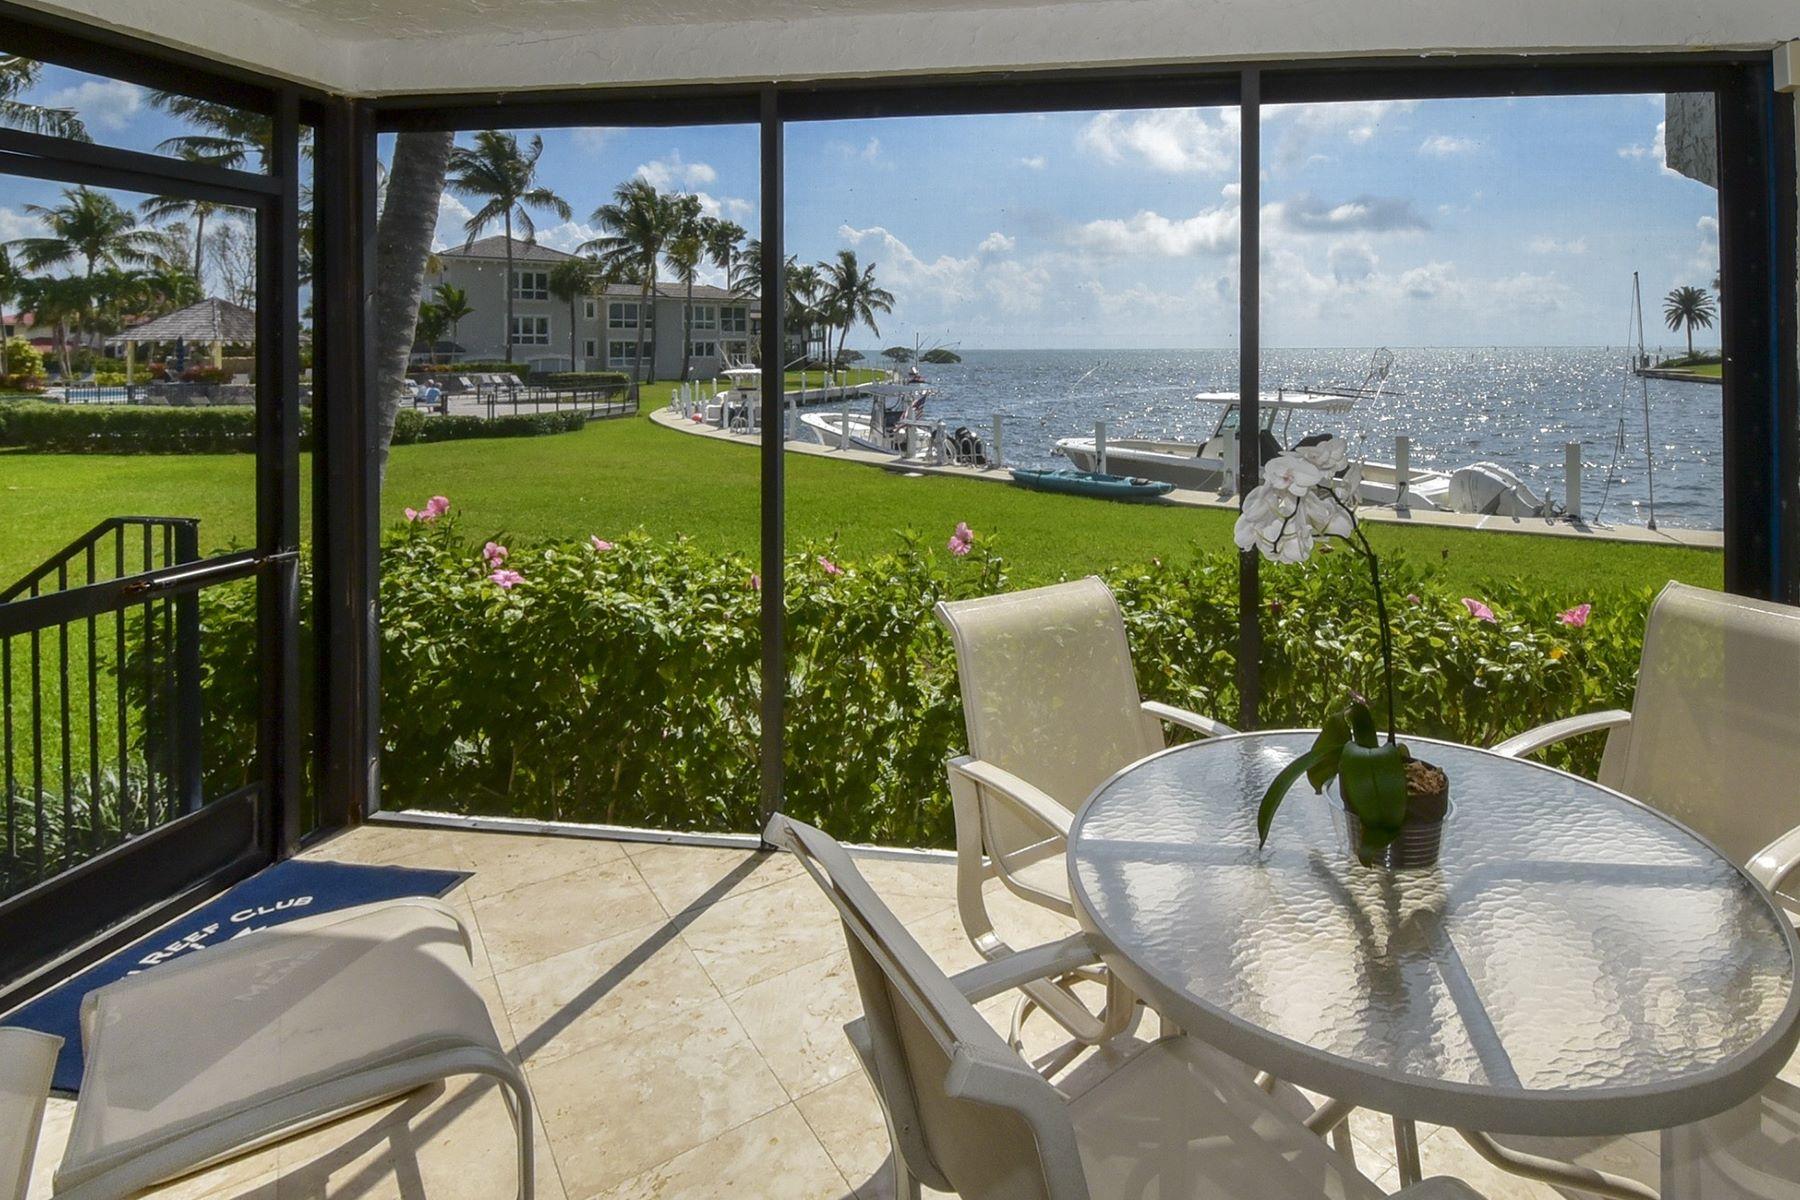 Condominiums 为 销售 在 81 Snapper Lane, #A, Key Largo, FL 81 Snapper Lane A 拉哥, 佛罗里达州 33037 美国